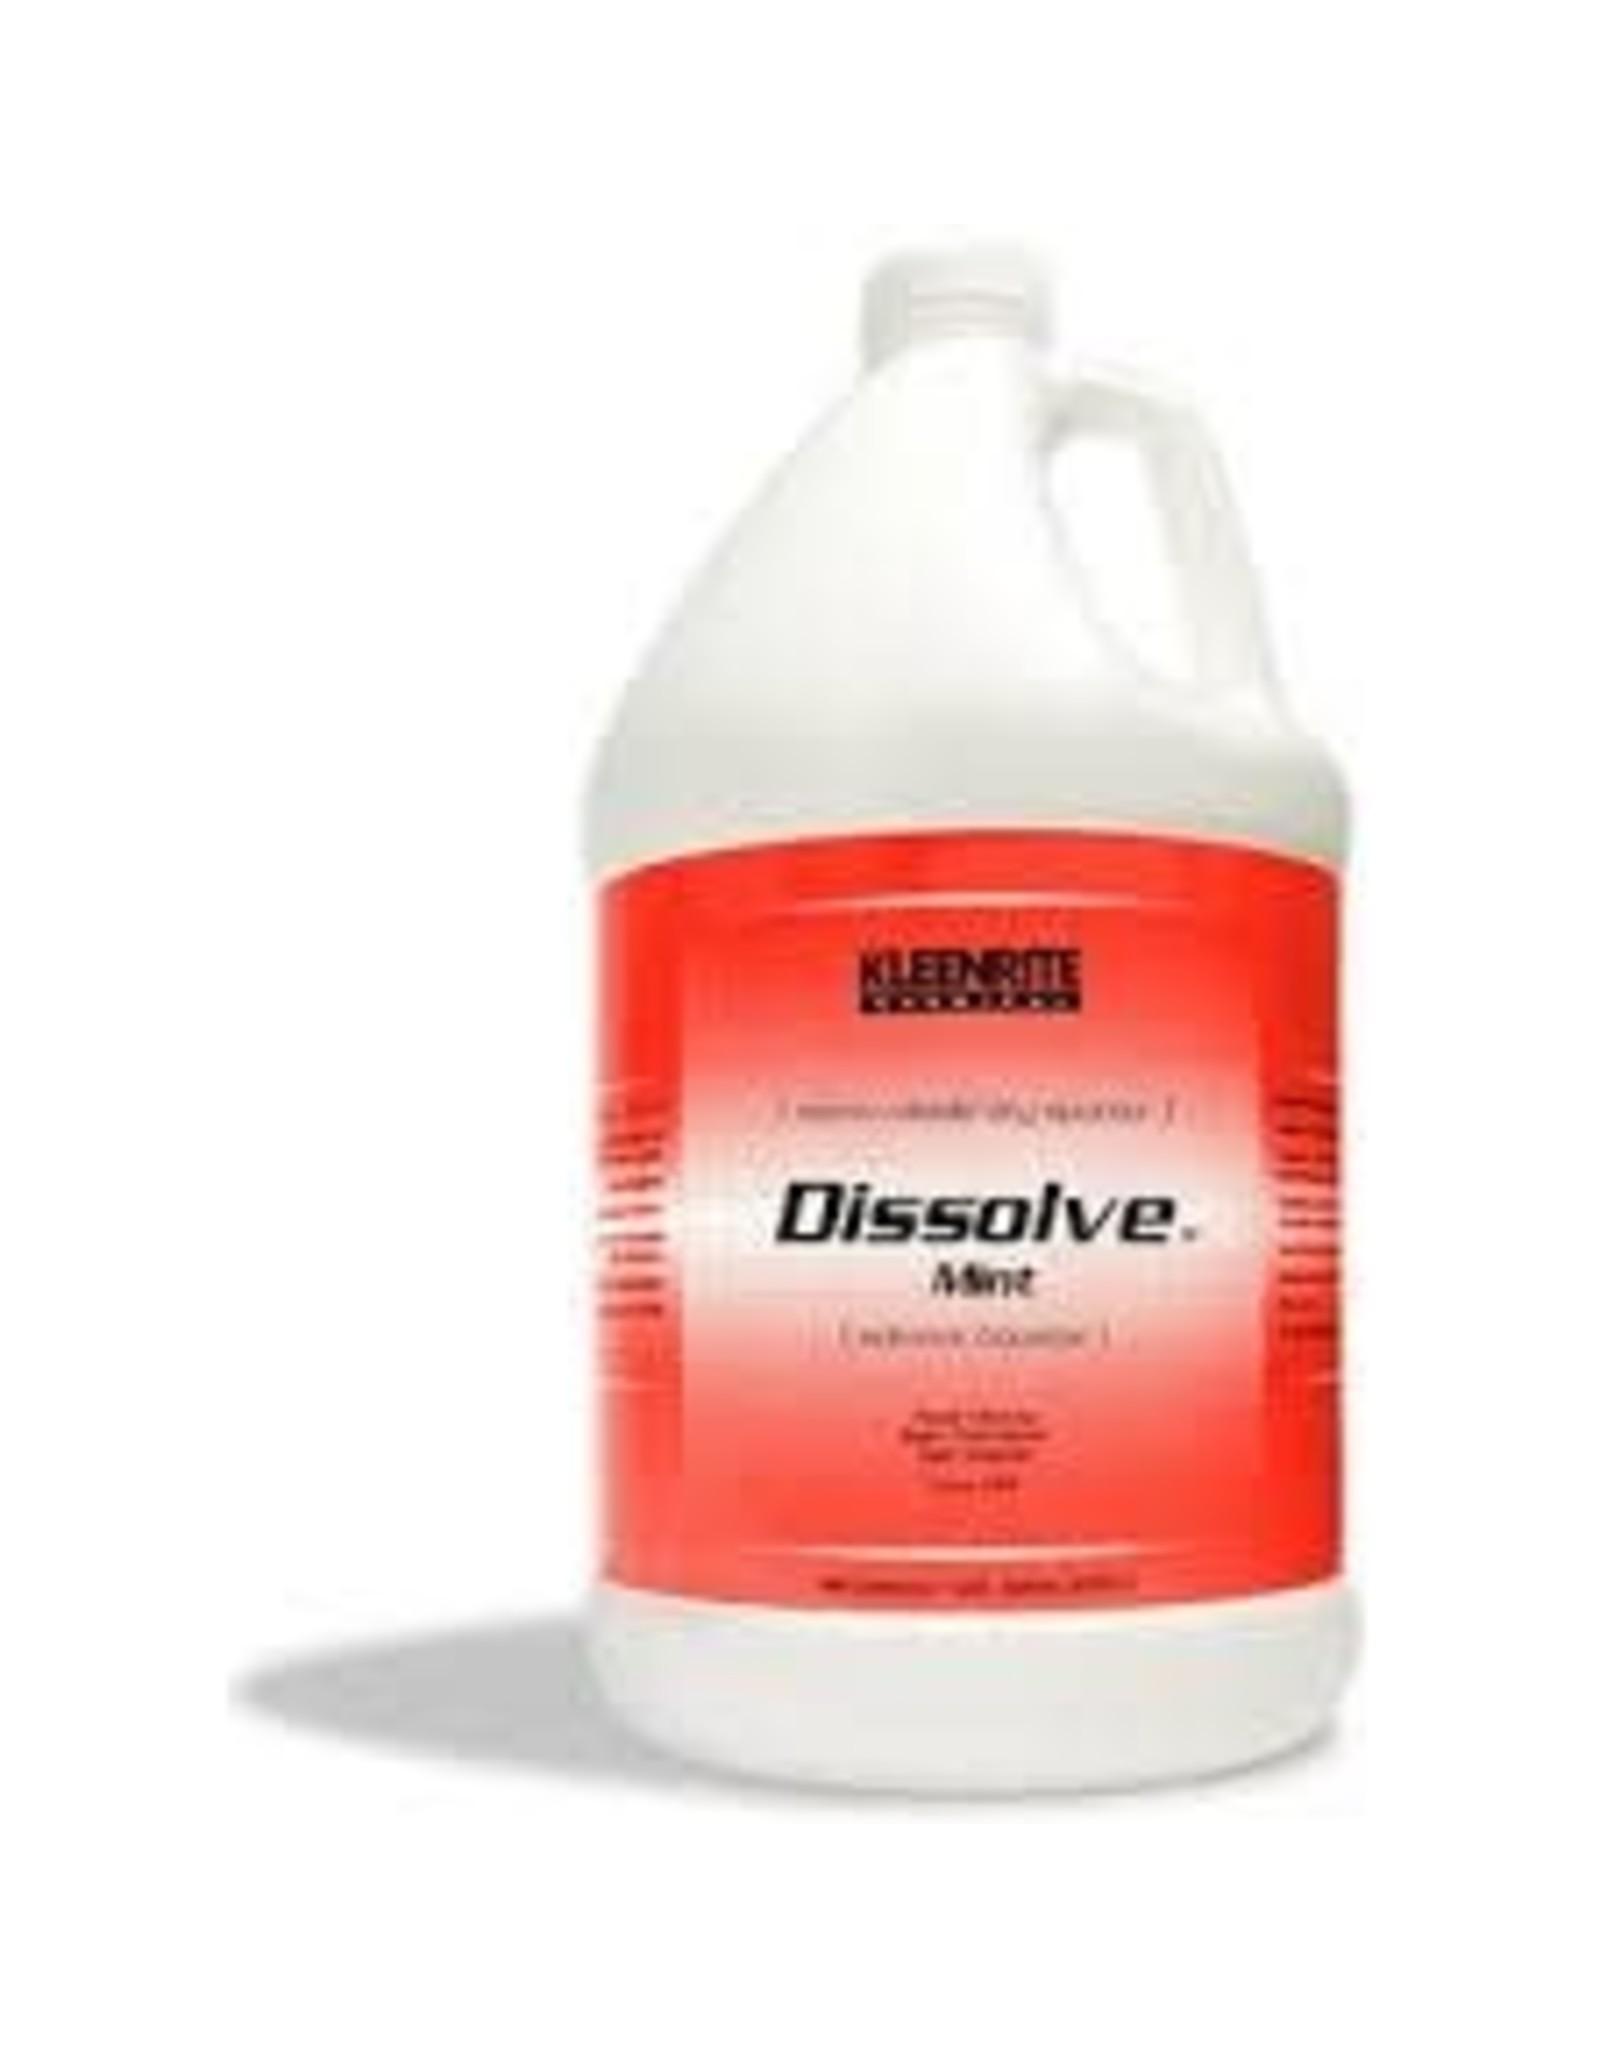 Kleenrite Dissolve Mint 1 GAL